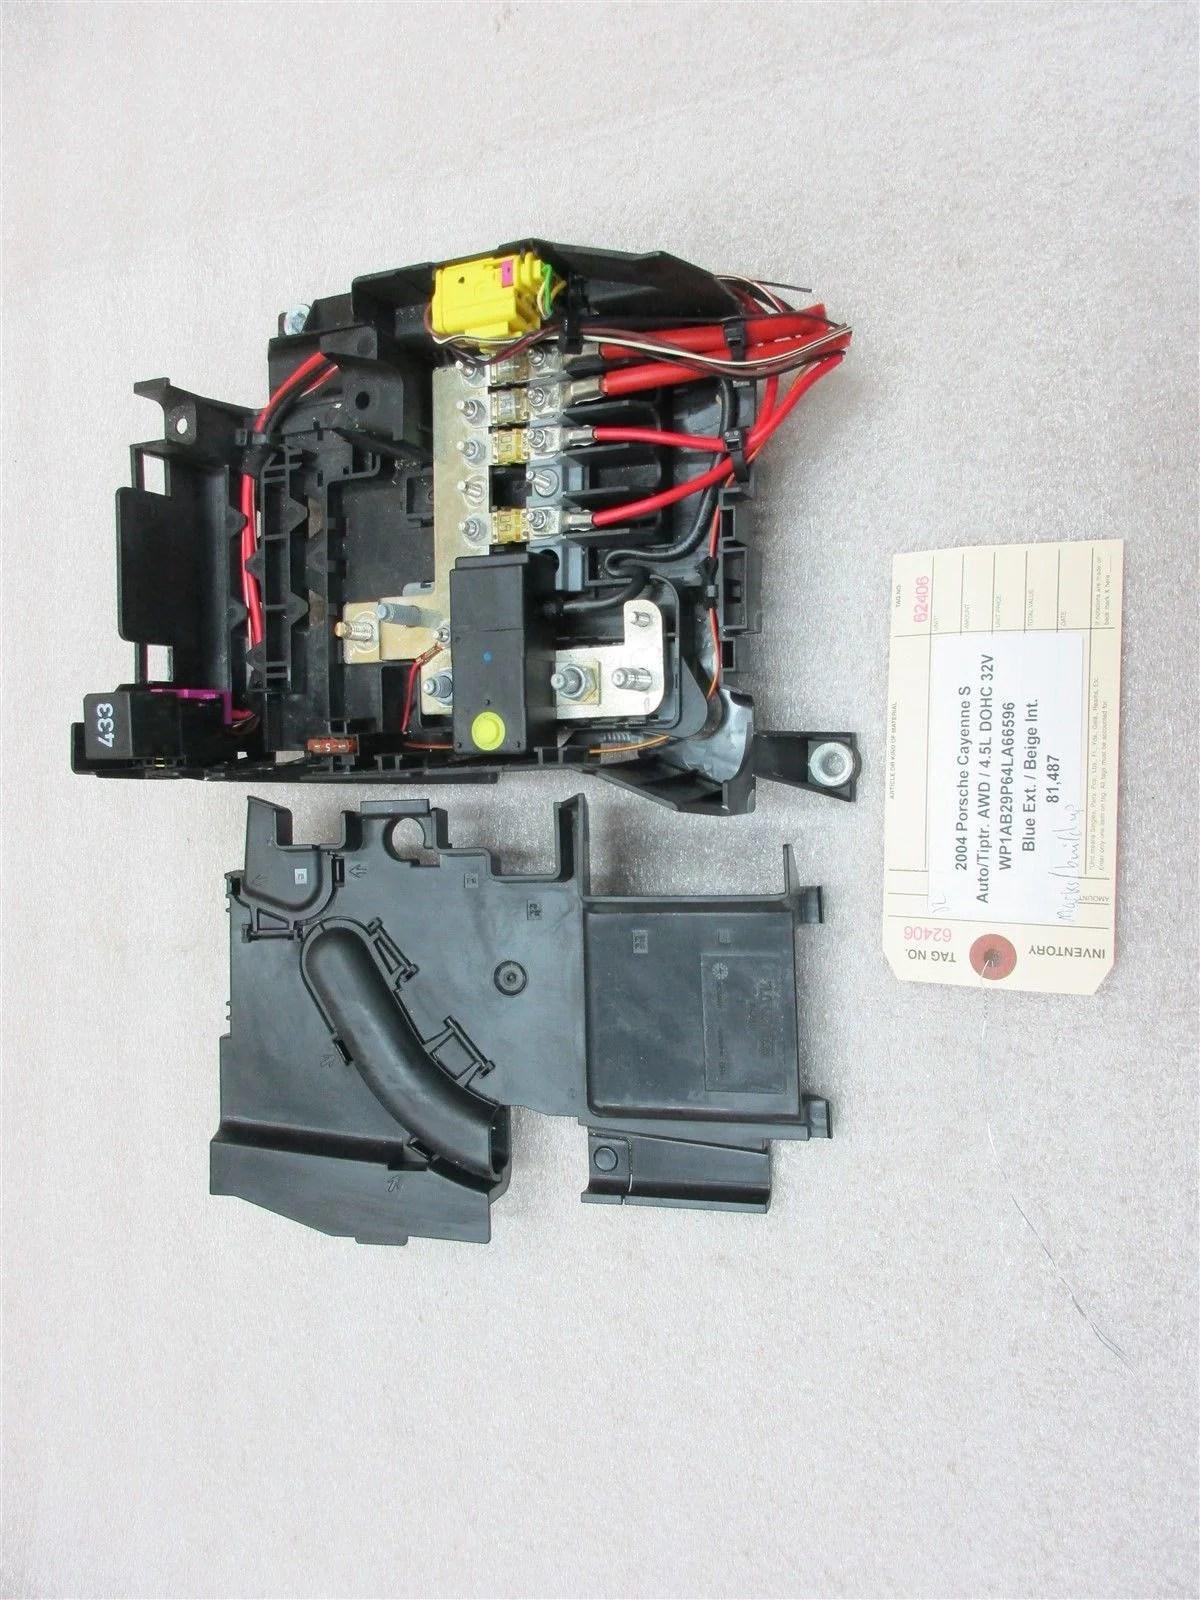 medium resolution of 04 cayenne s awd porsche 955 fuse box relay 7l0937548a 7l0937555 8104 cayenne s awd porsche